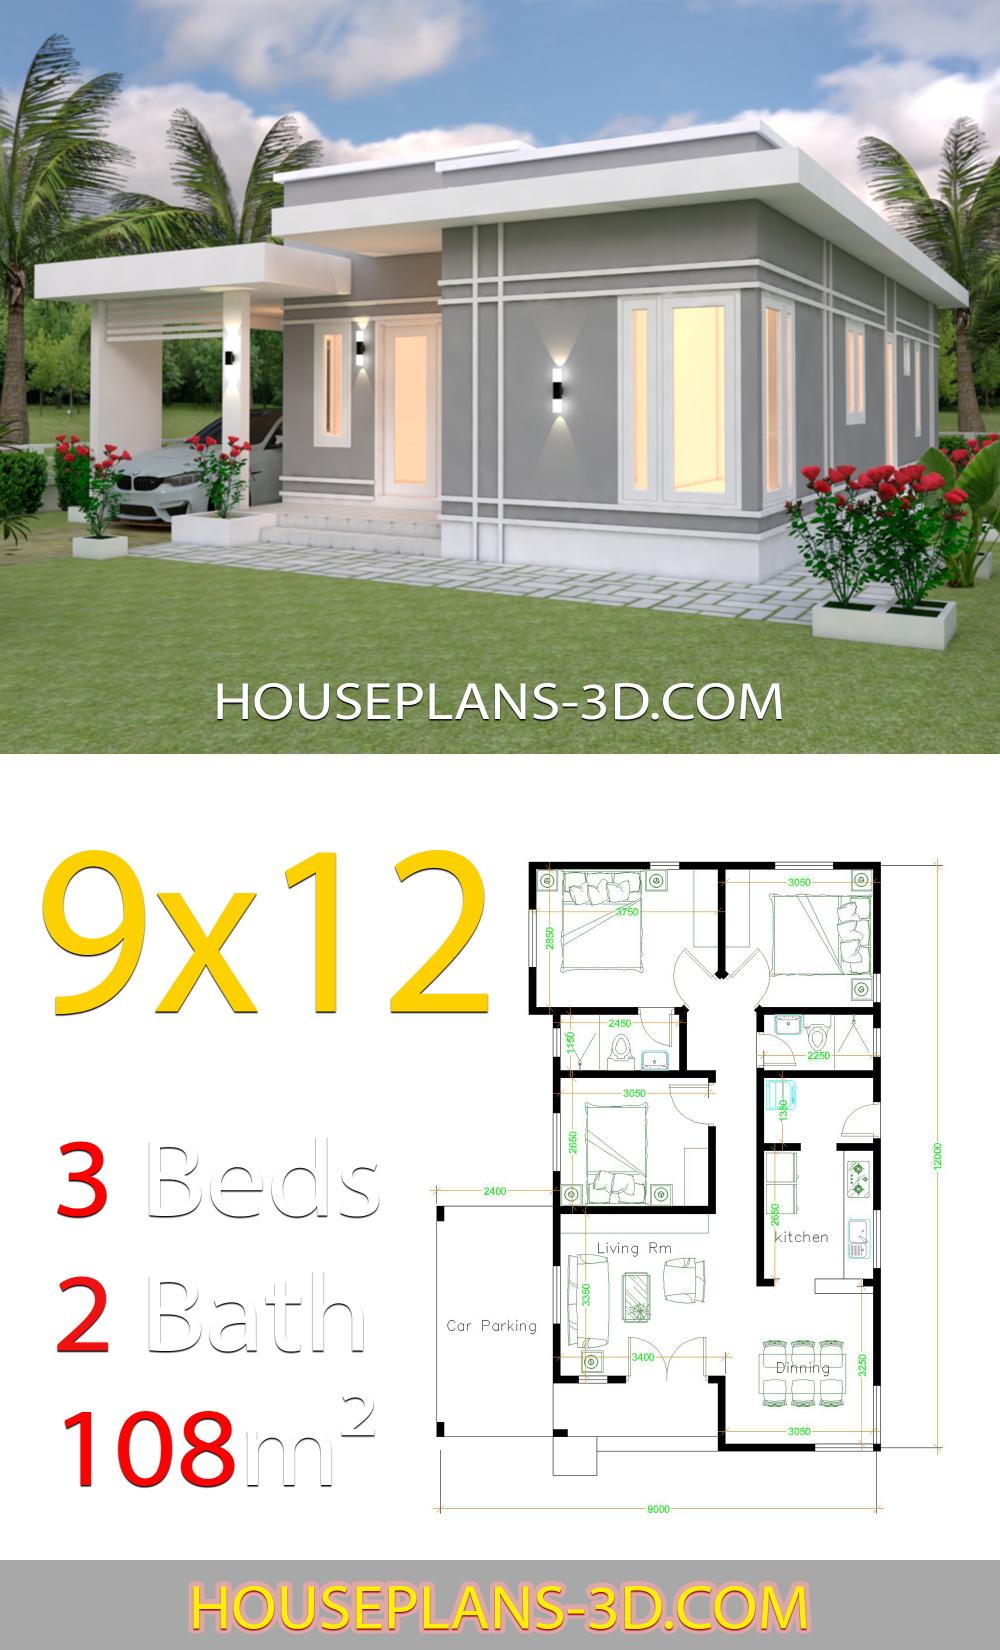 26+ Home design 3d roof tutorial ideas in 2021